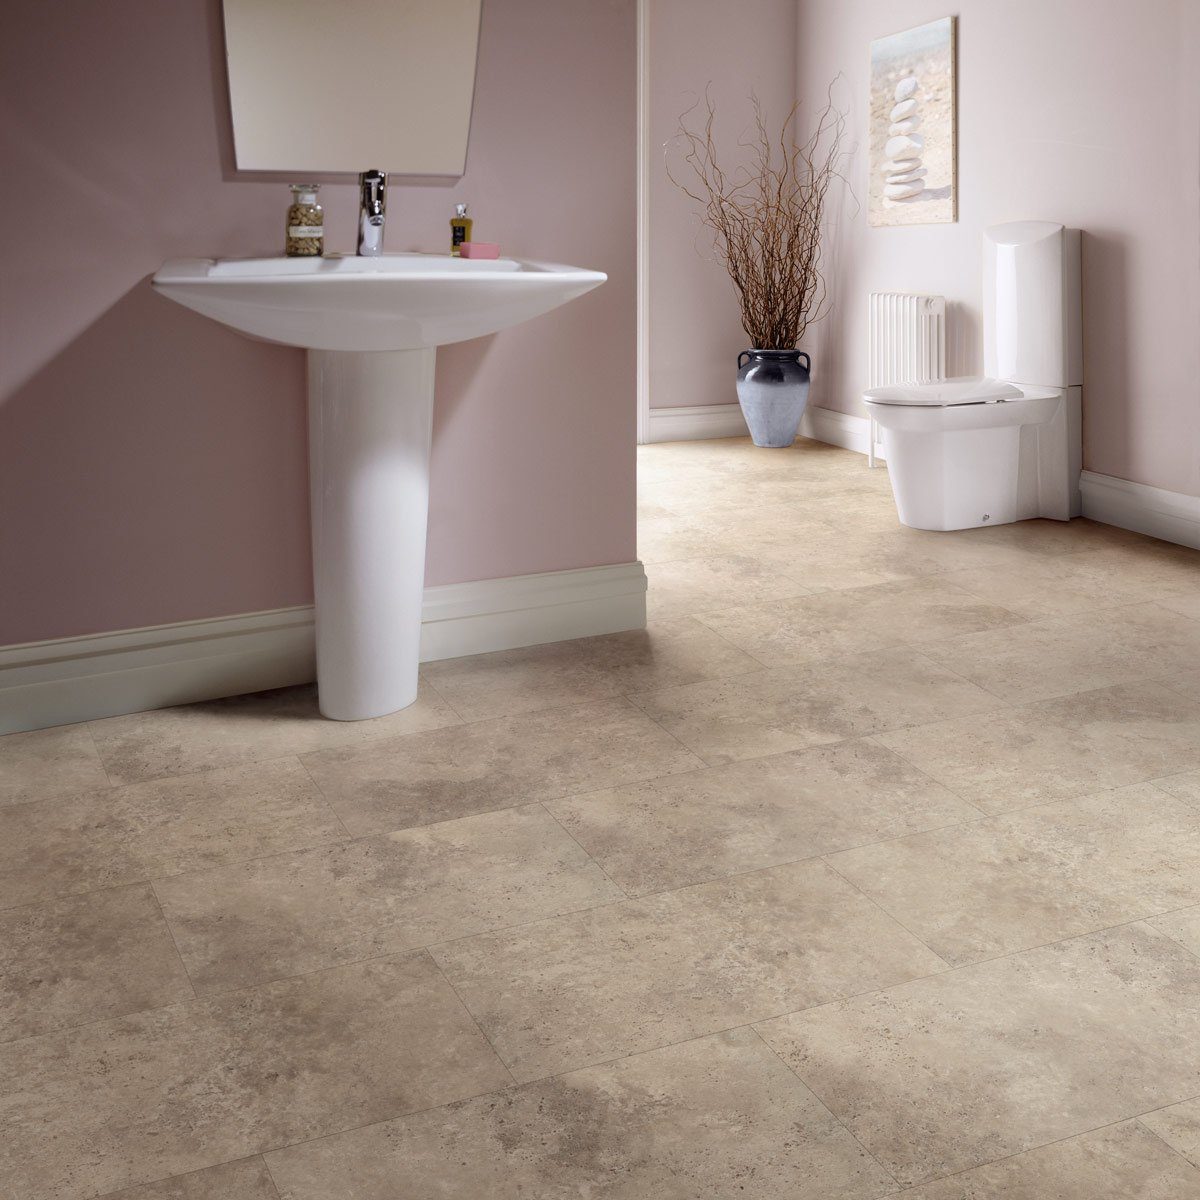 ... the Karndean Palio Clic Stone Tile vinyl flooring is perfect for the bathroom. http://ow.ly/TAXP30m7gpC #bathroom #bathroominspo #dreambathroom ...